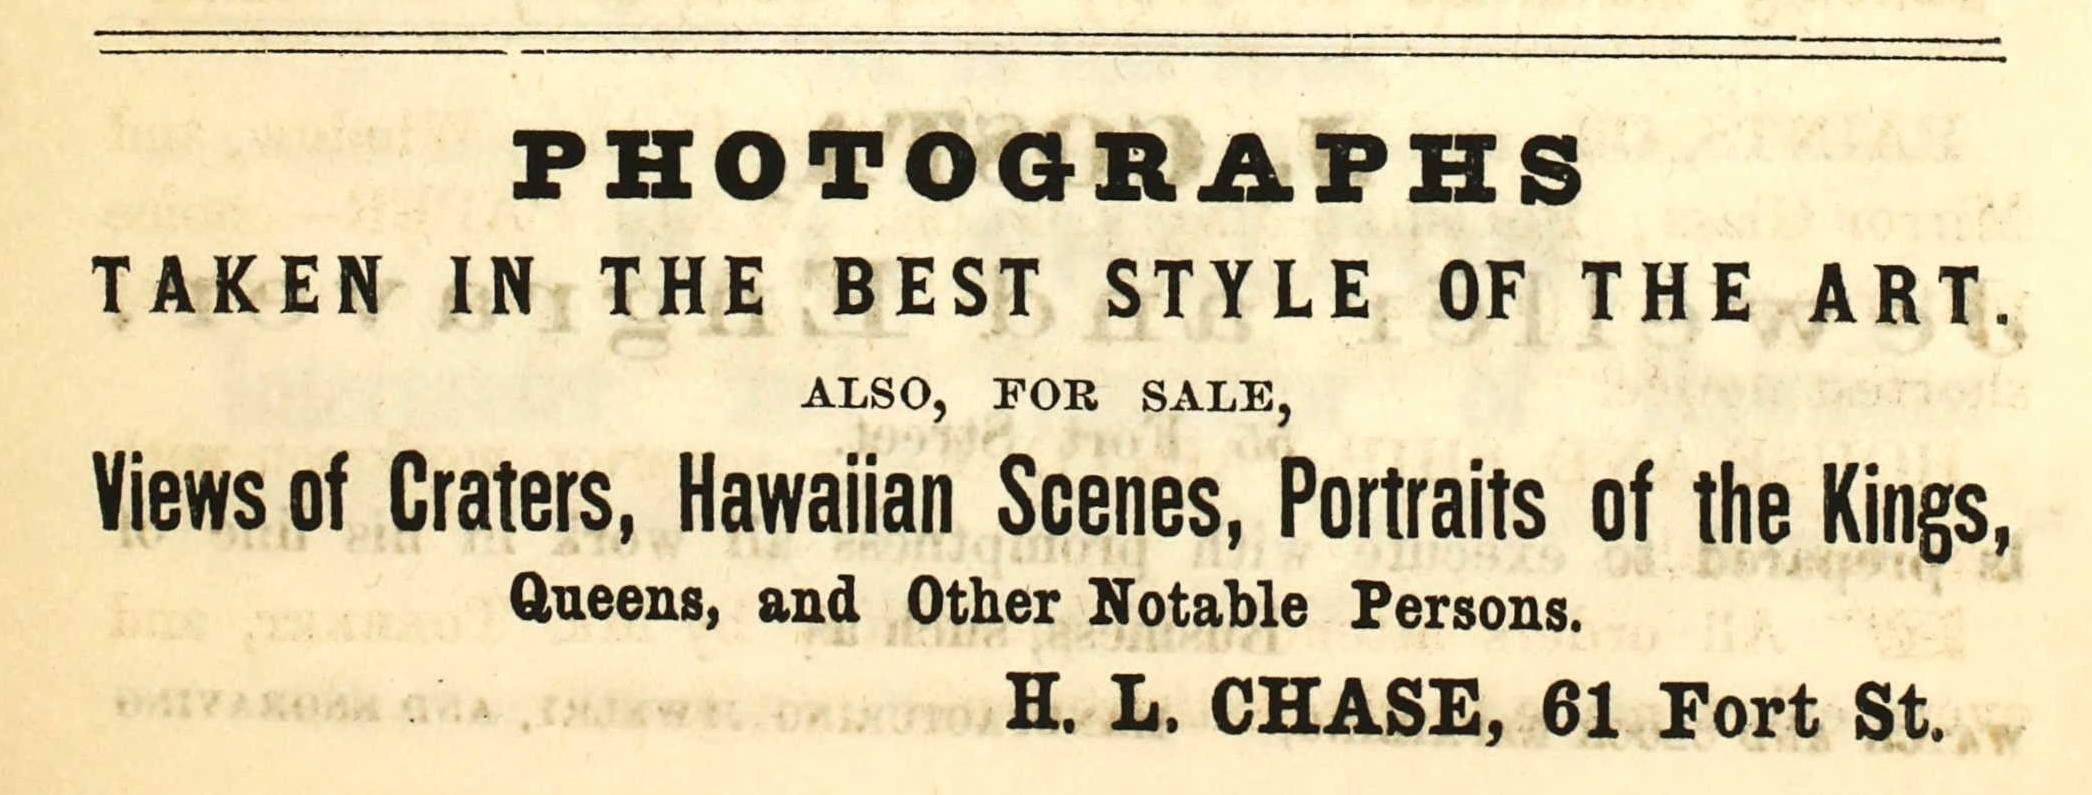 H. L. Chase, photographer, Honolulu, Hawaii